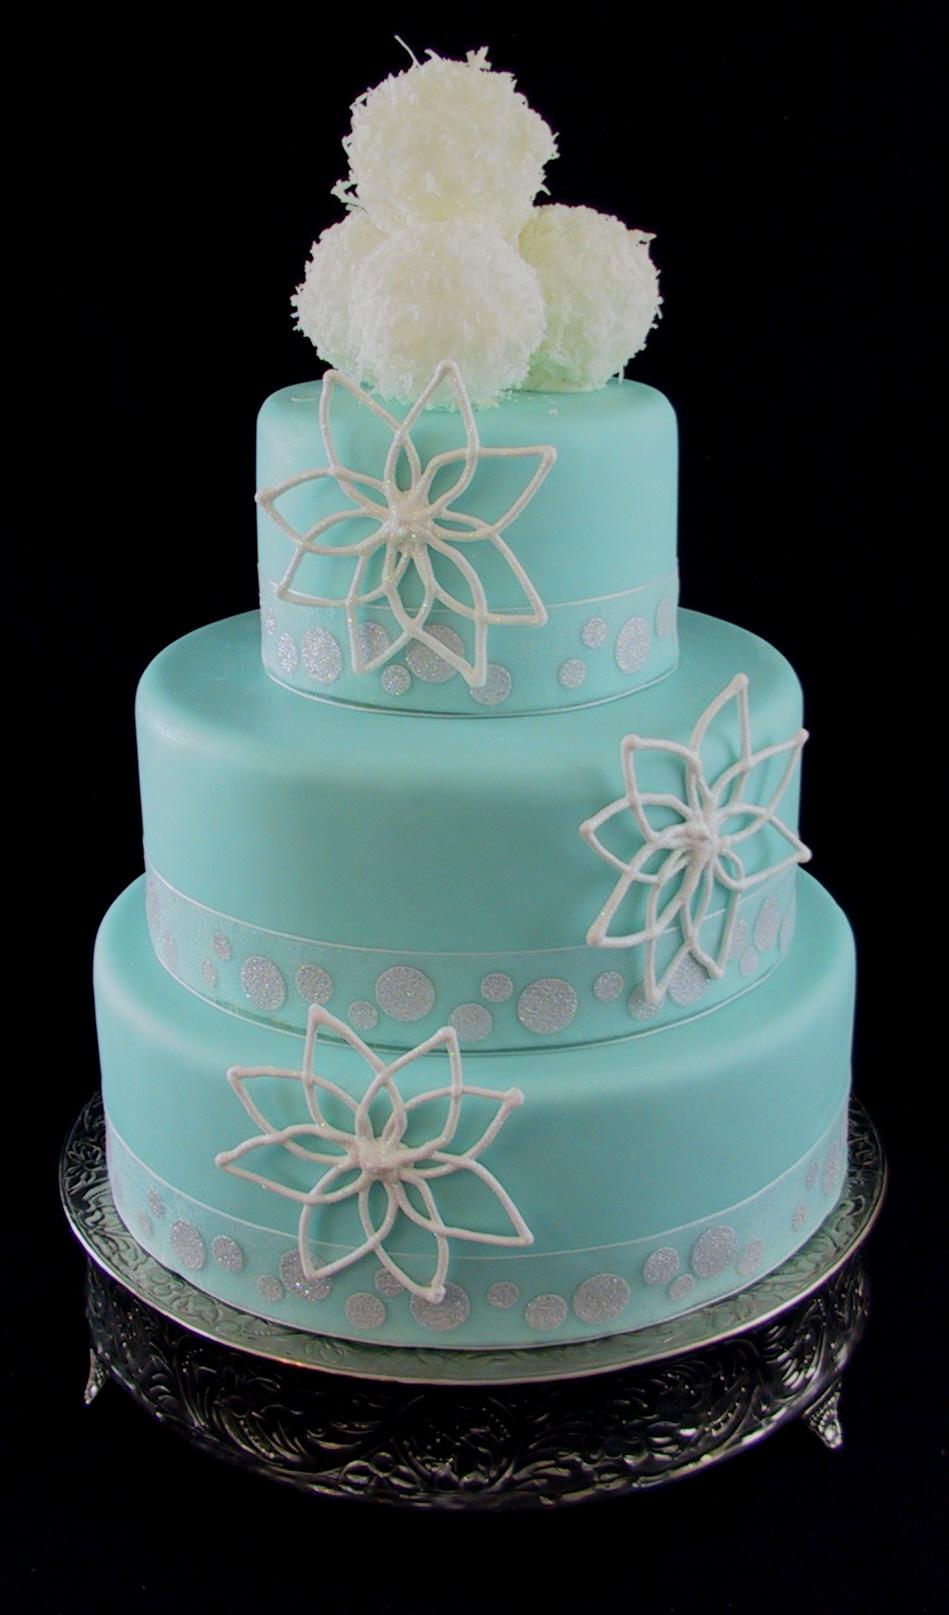 Fondant Wedding Cake Tiffany Blue With Snow Flake And Snow